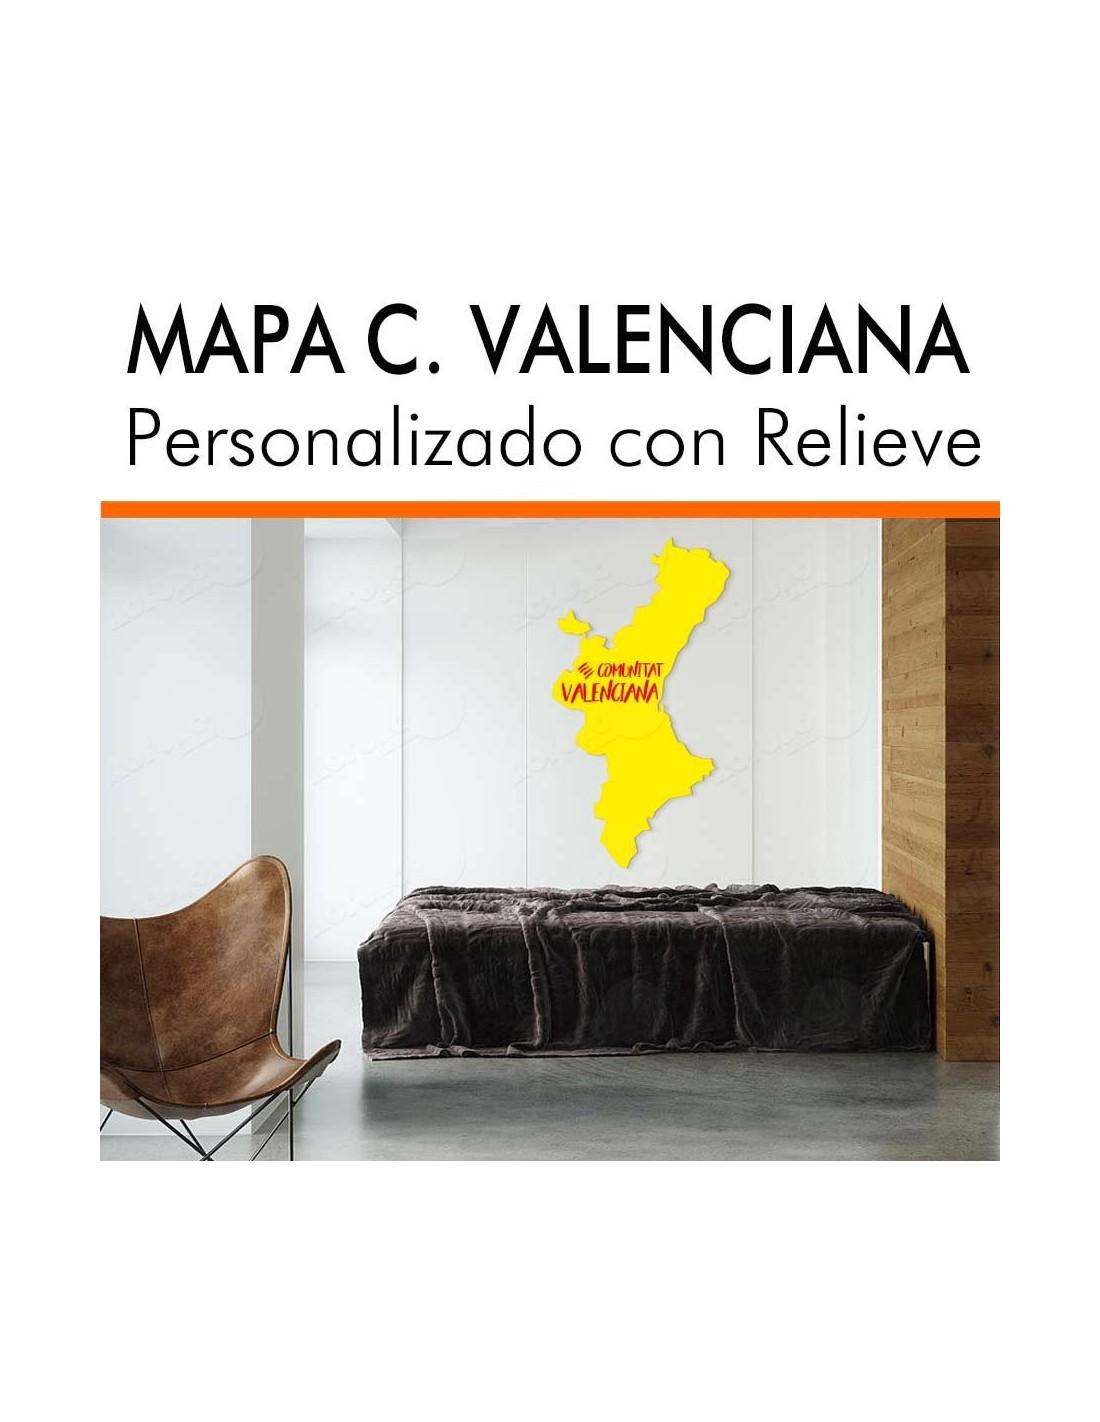 Mapa C. Valenciana en relieve